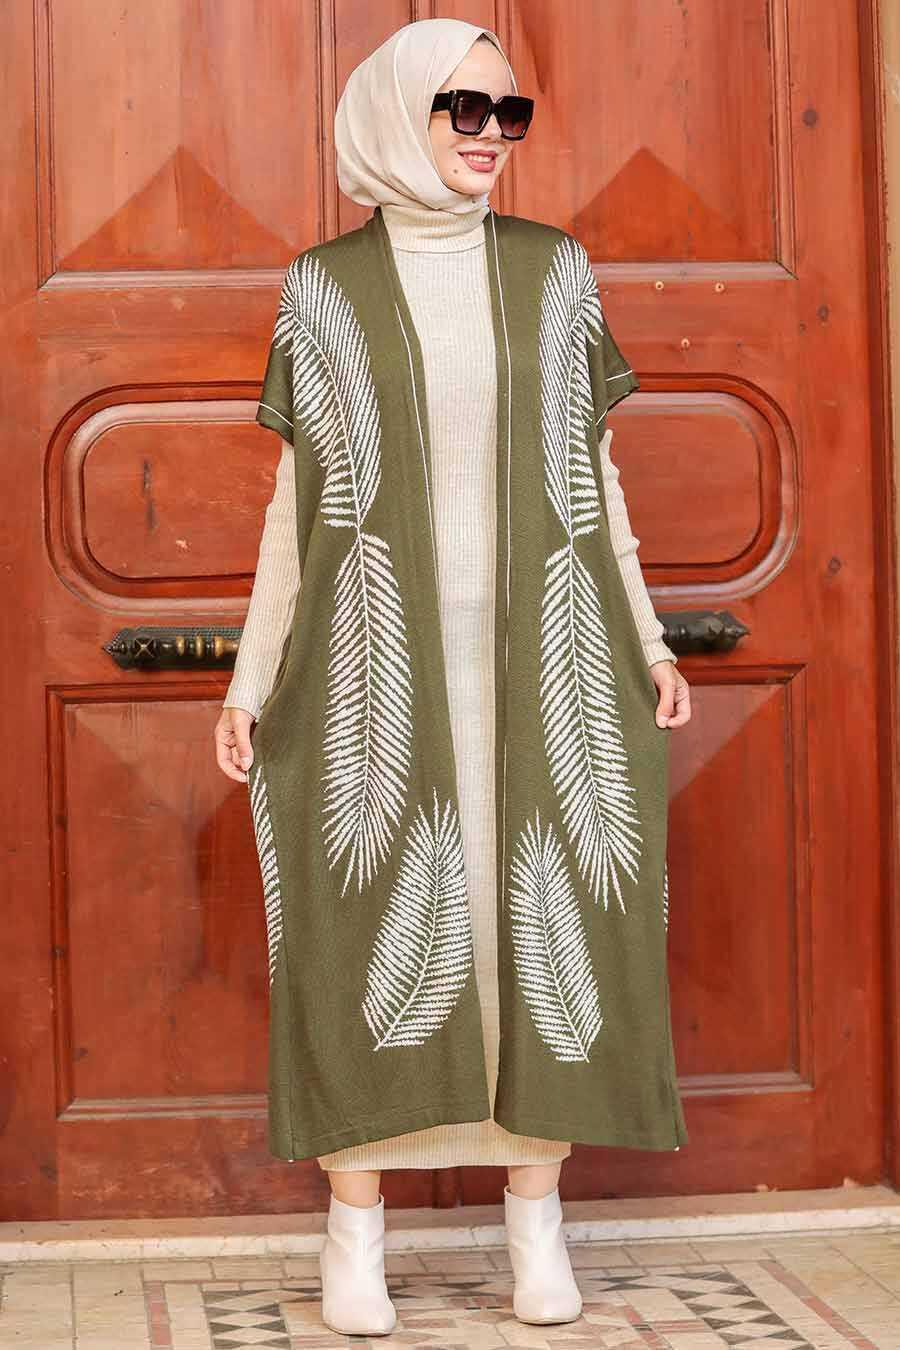 Khaki Hijab Knitwear Suit Dress 3183HK